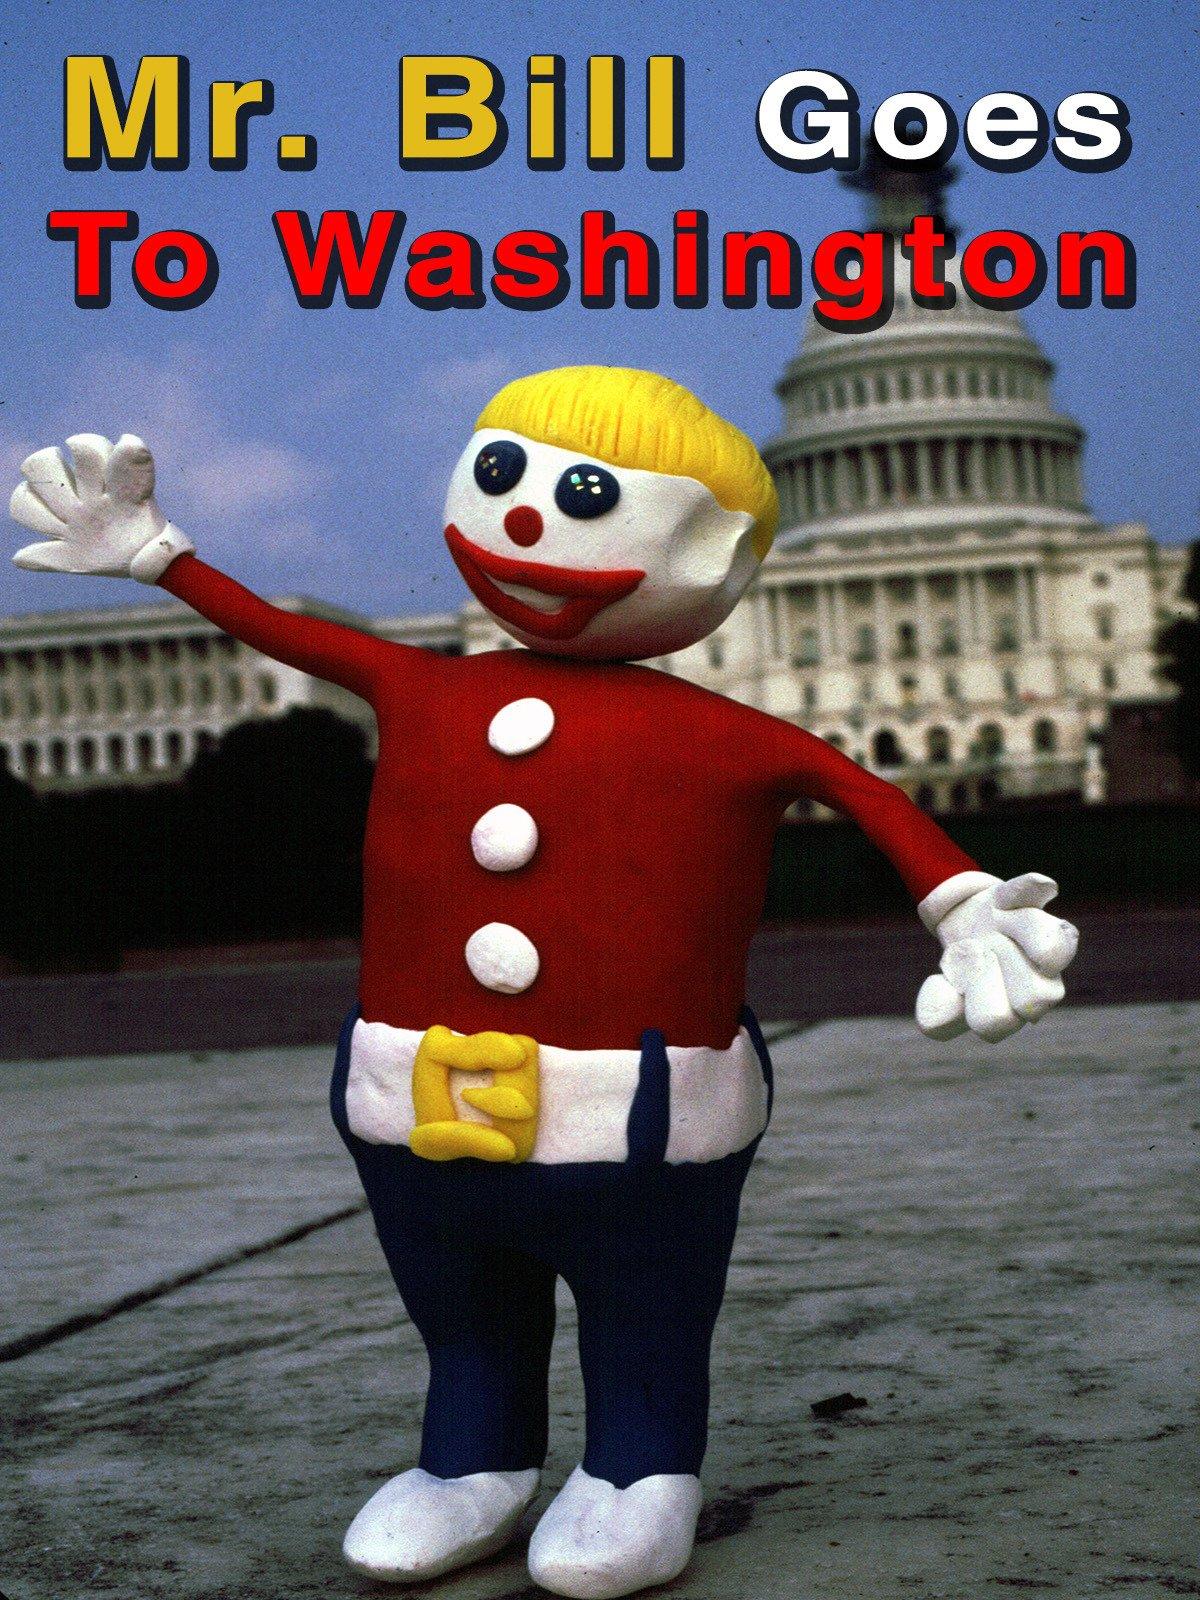 Mr. Bill Goes To Washington